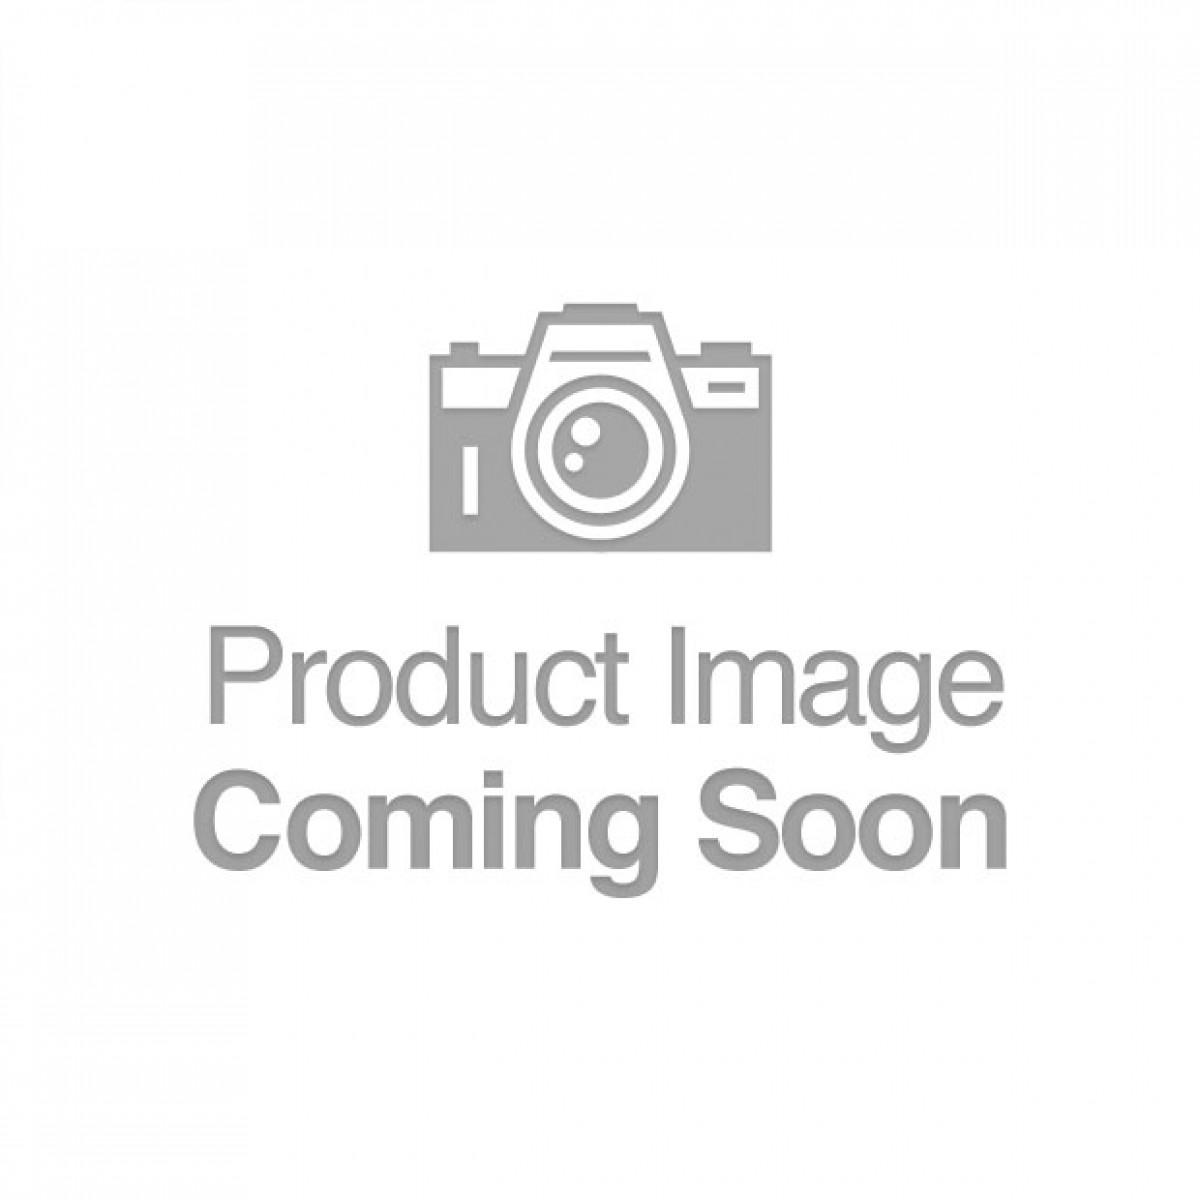 Shots Pumped Elite Beginner Pump w/PSI Gauge - Transparent